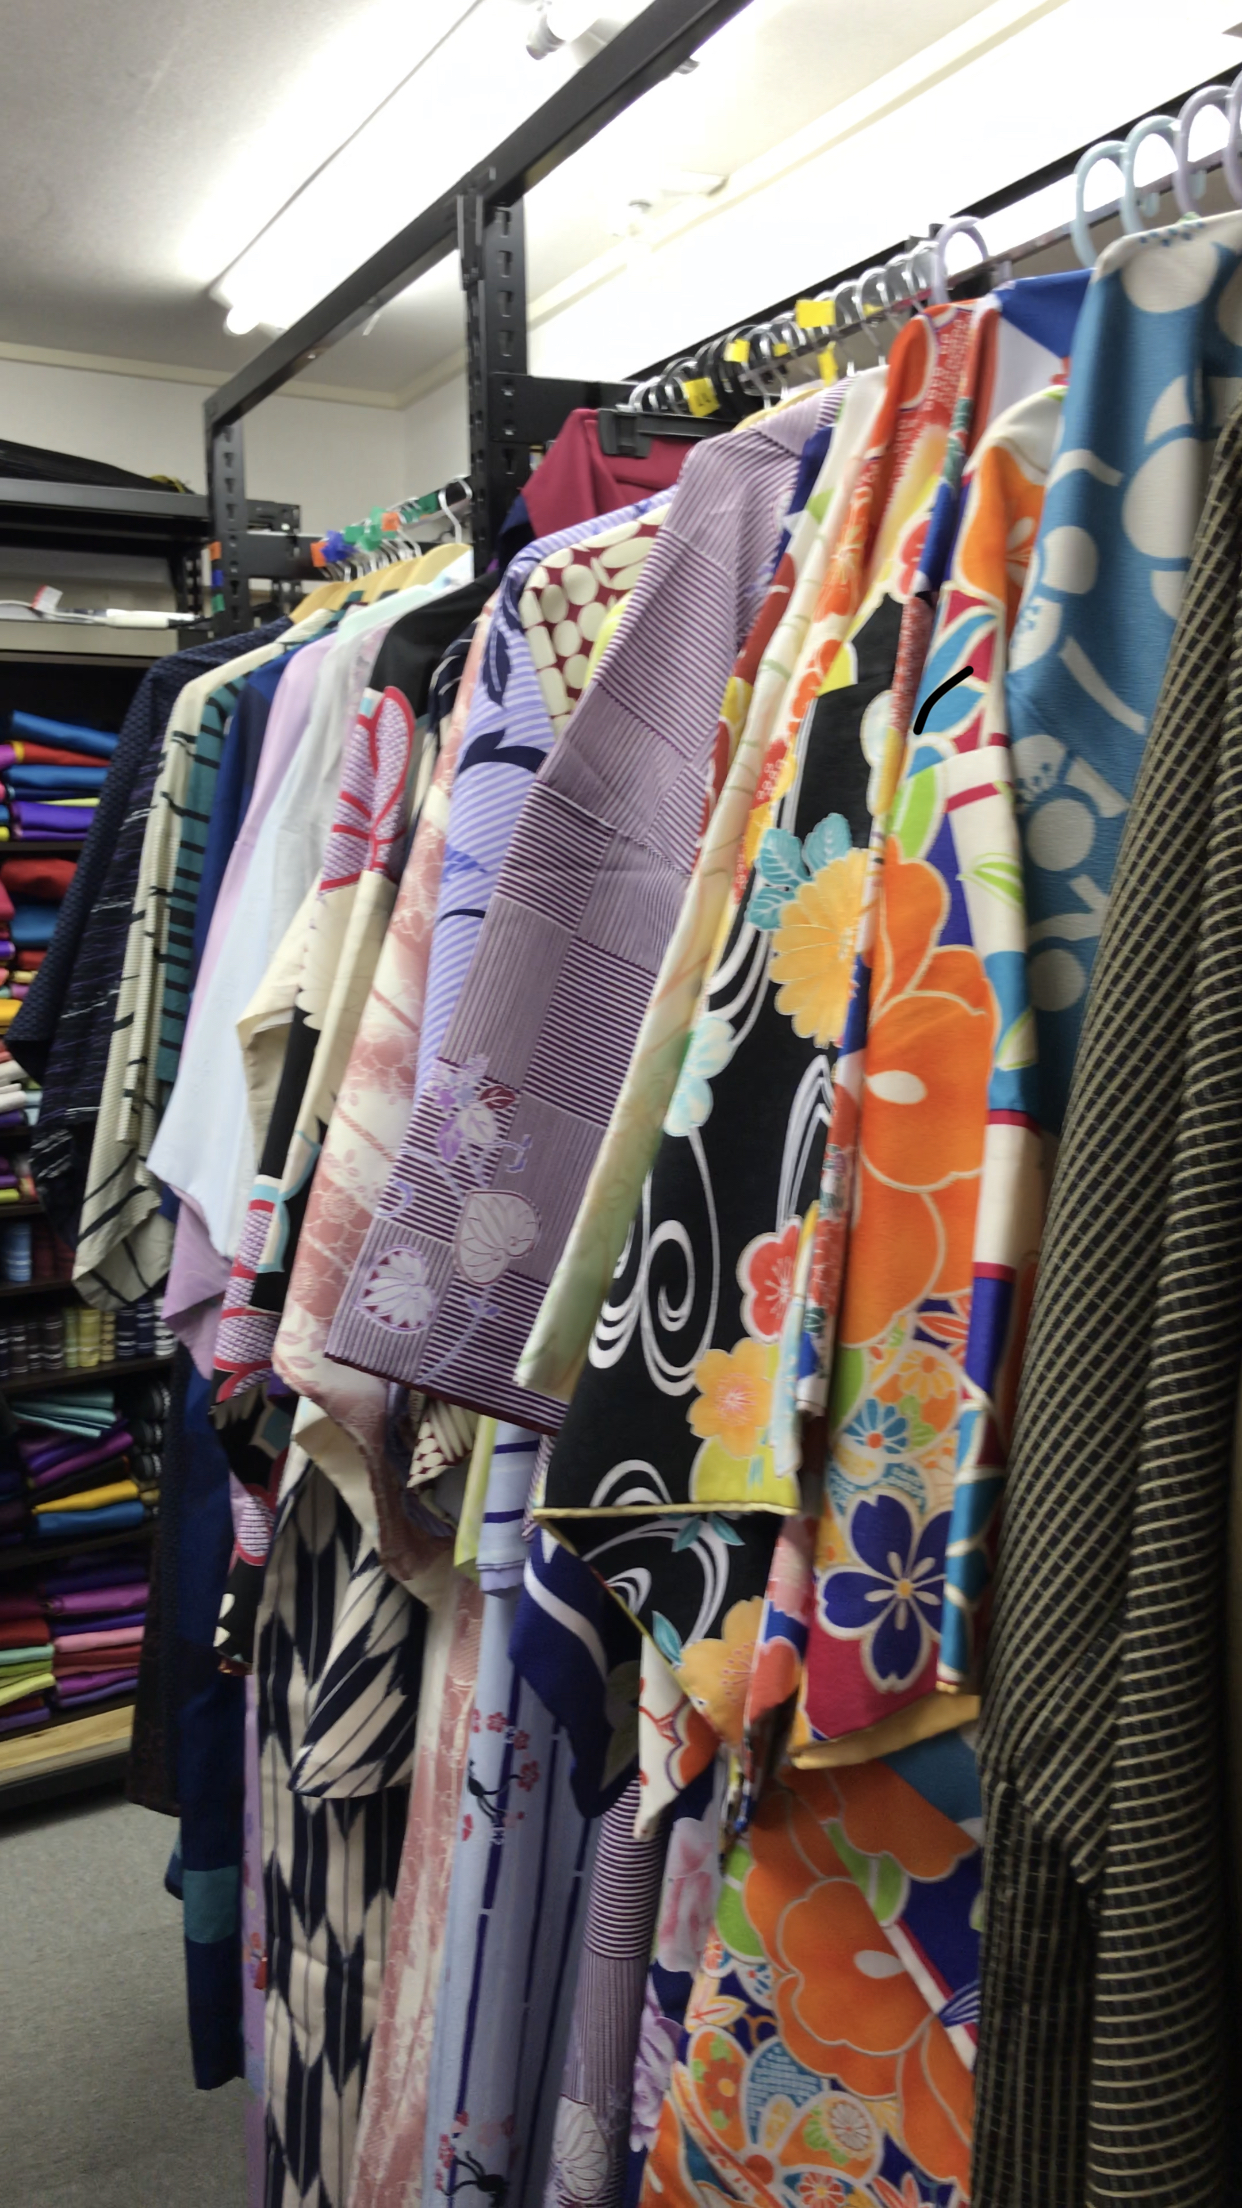 Vow Renewal Tineline - Kimono Shop